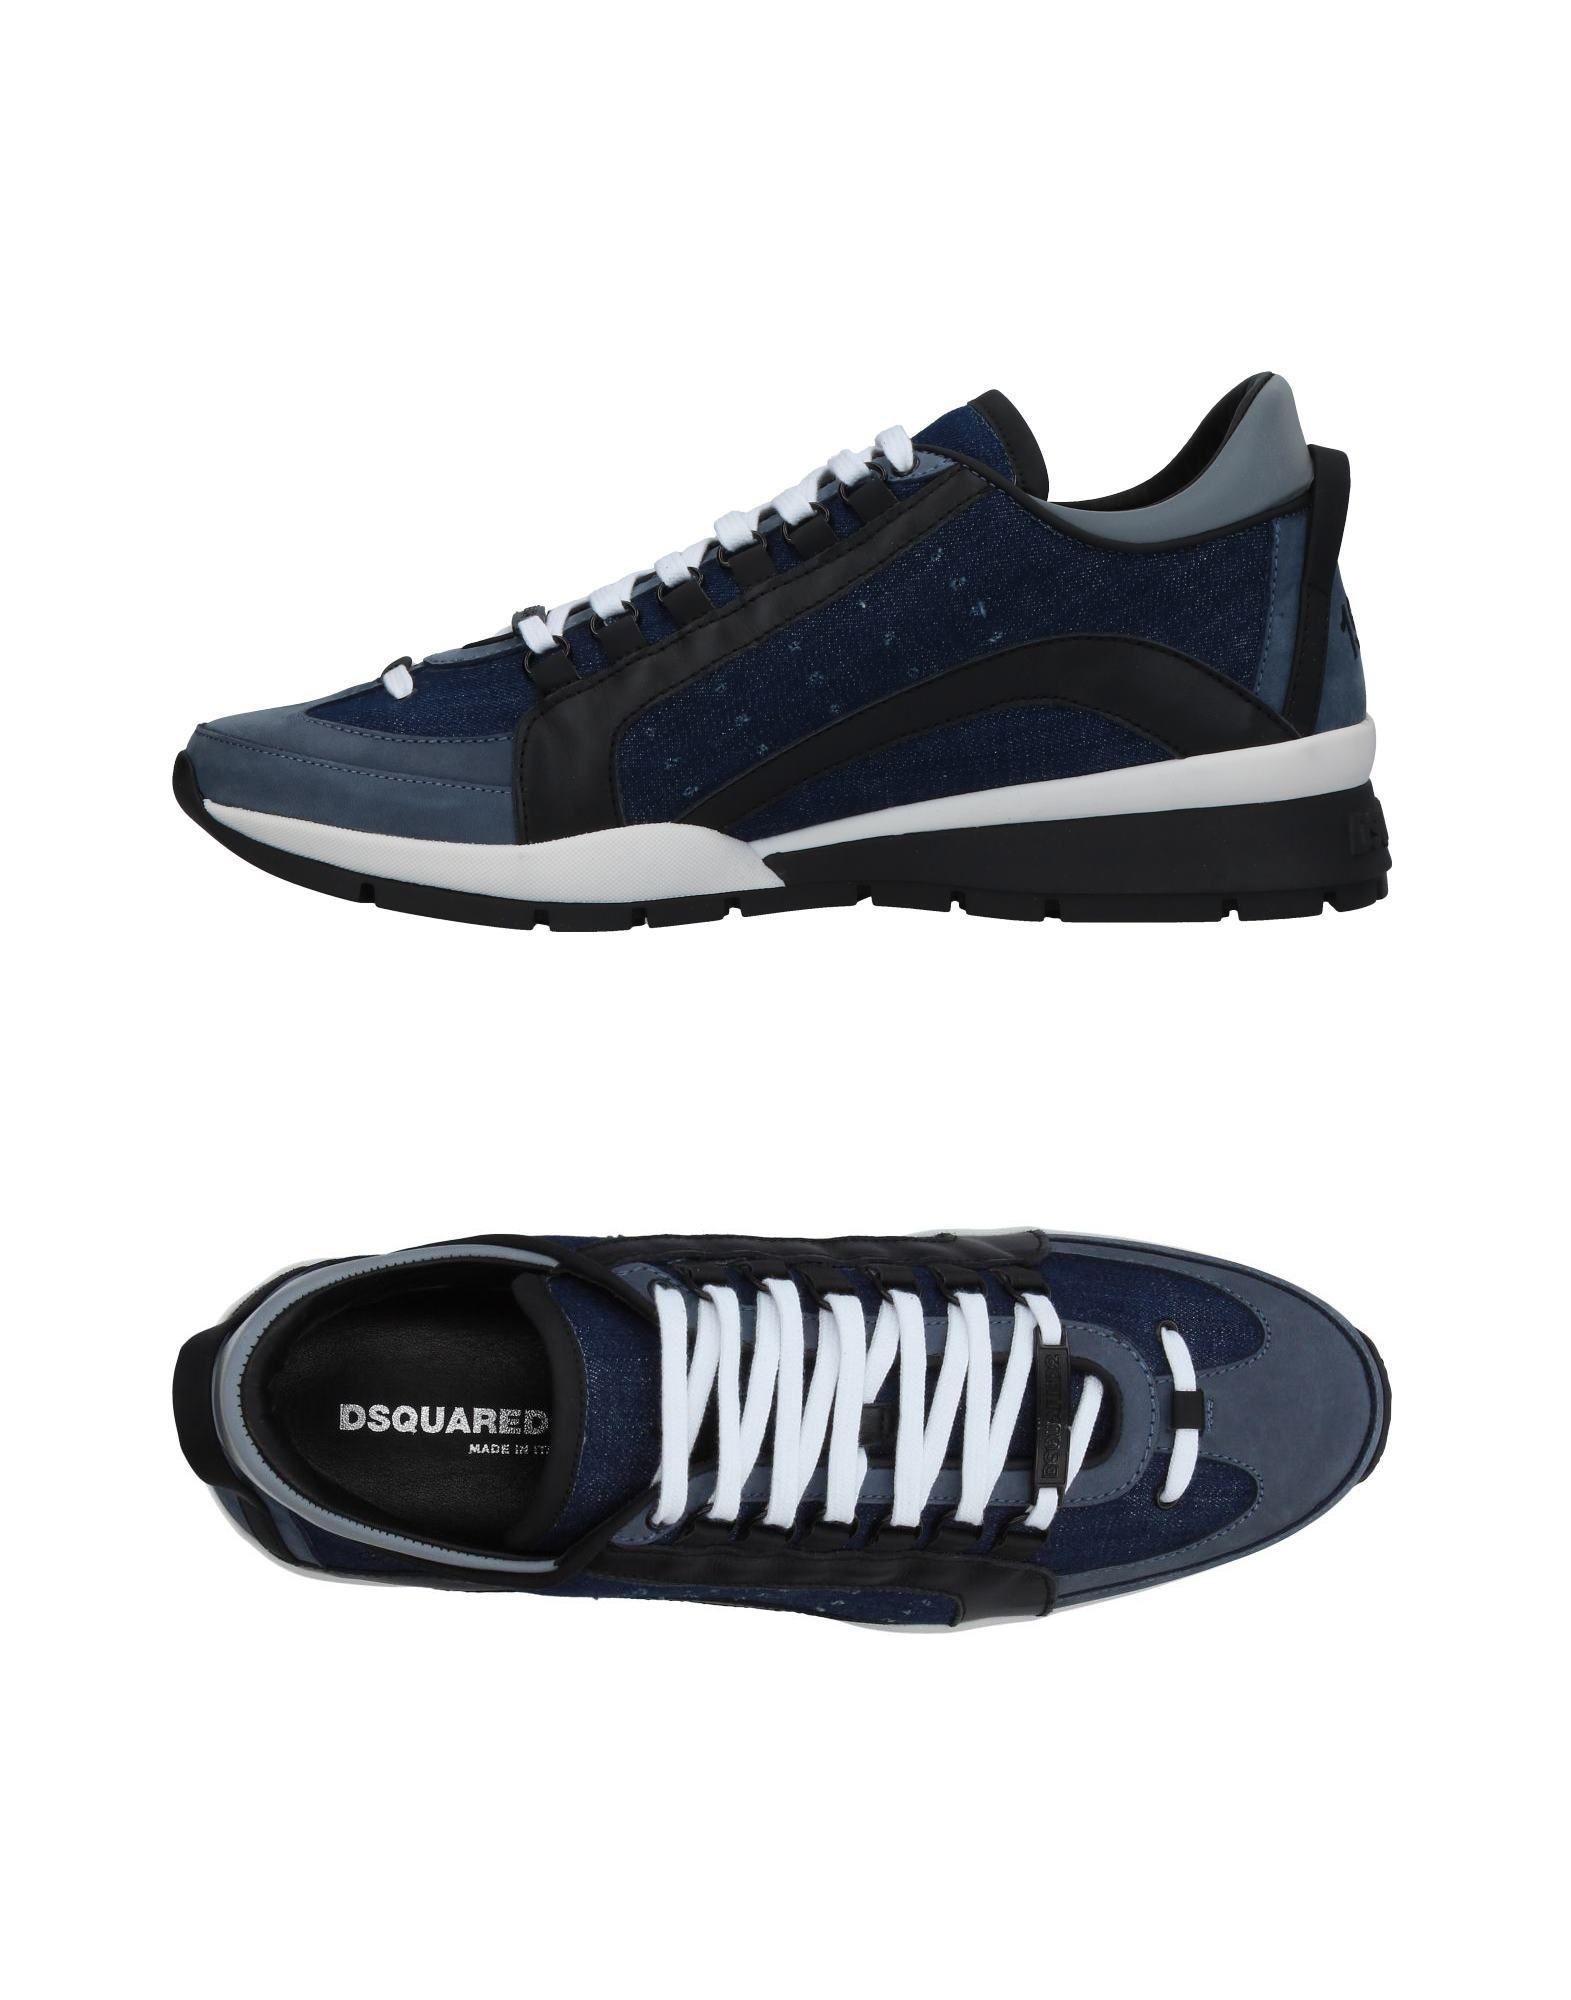 Dsquared2 Gute Sneakers Herren  11409372LO Gute Dsquared2 Qualität beliebte Schuhe bff750